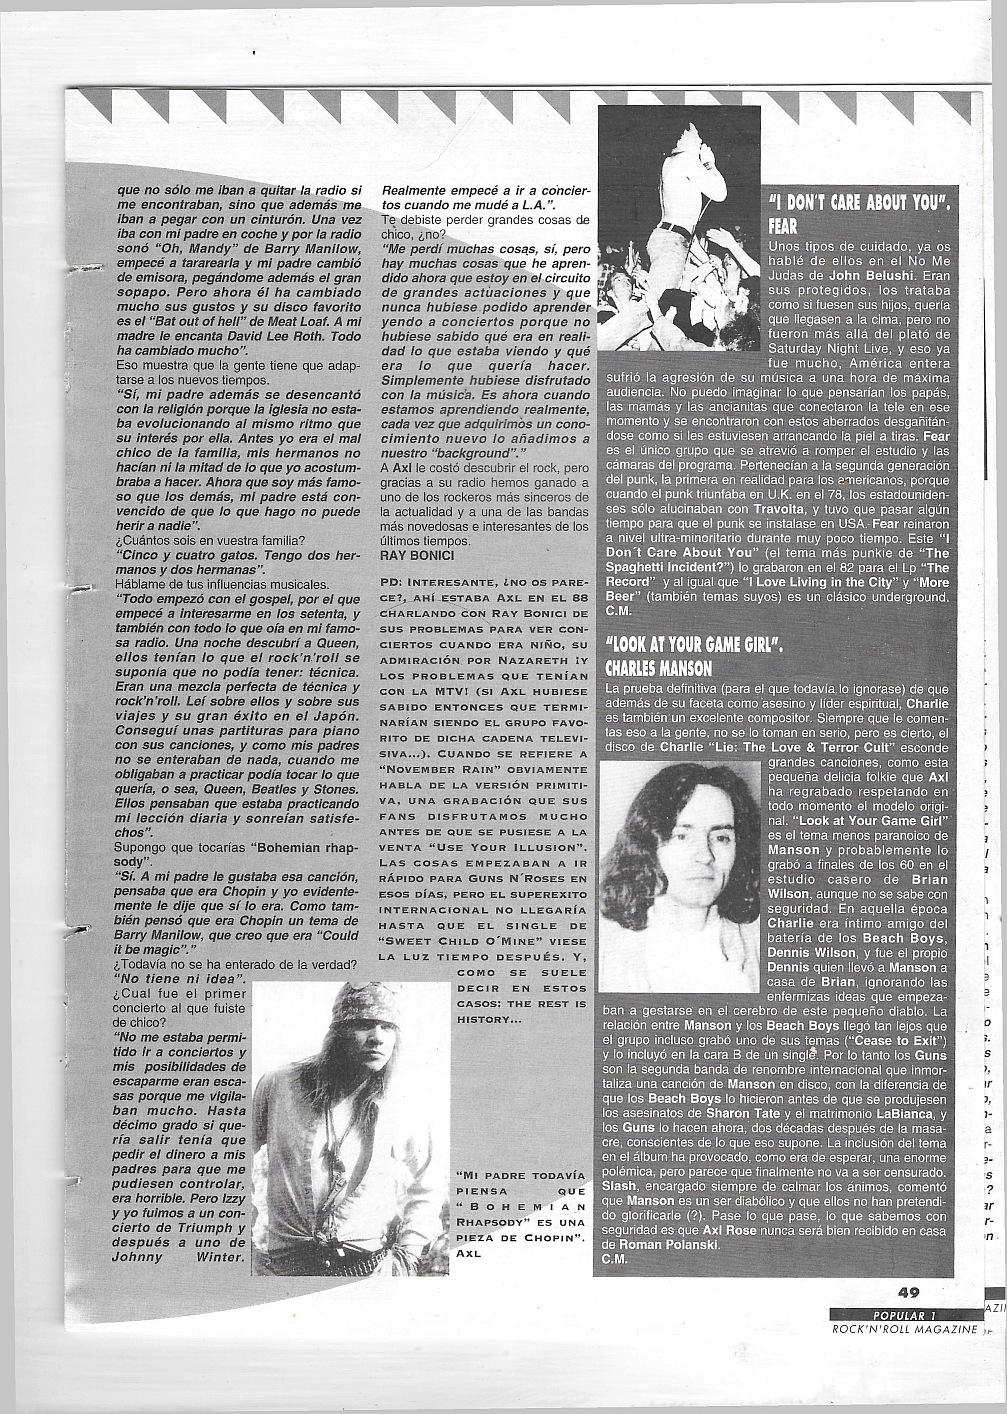 1988.04.DD - Popular 1 - Interview with Axl 1993_131